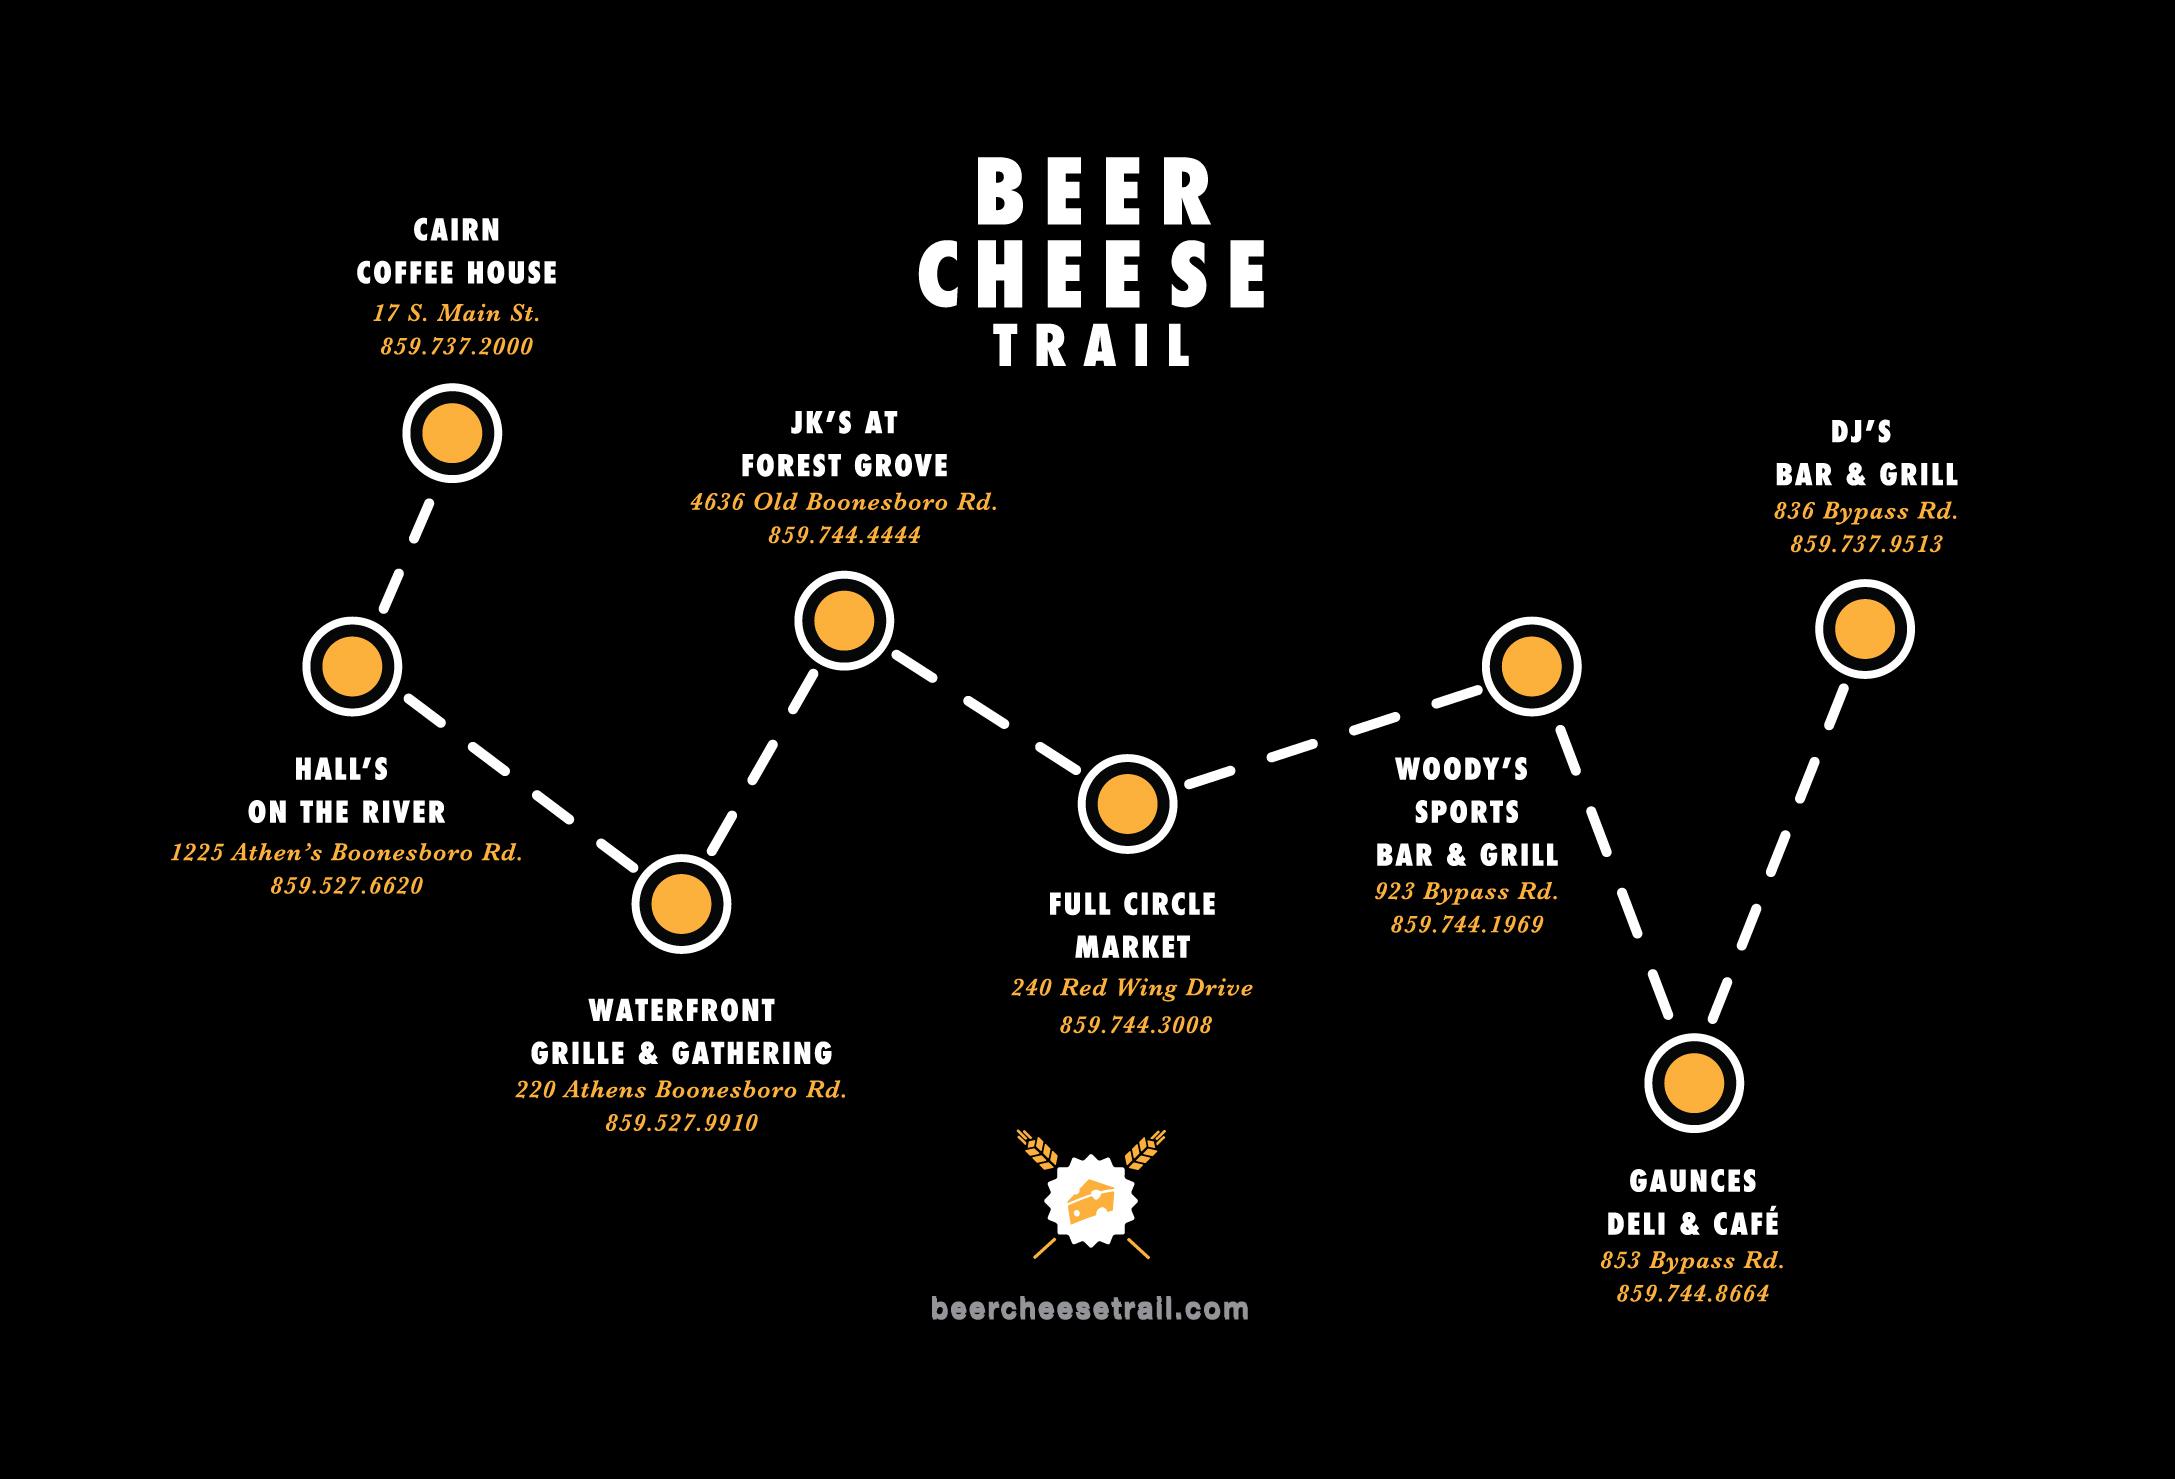 BeerCheeseTrail_7x5_tabletent_2015_V2